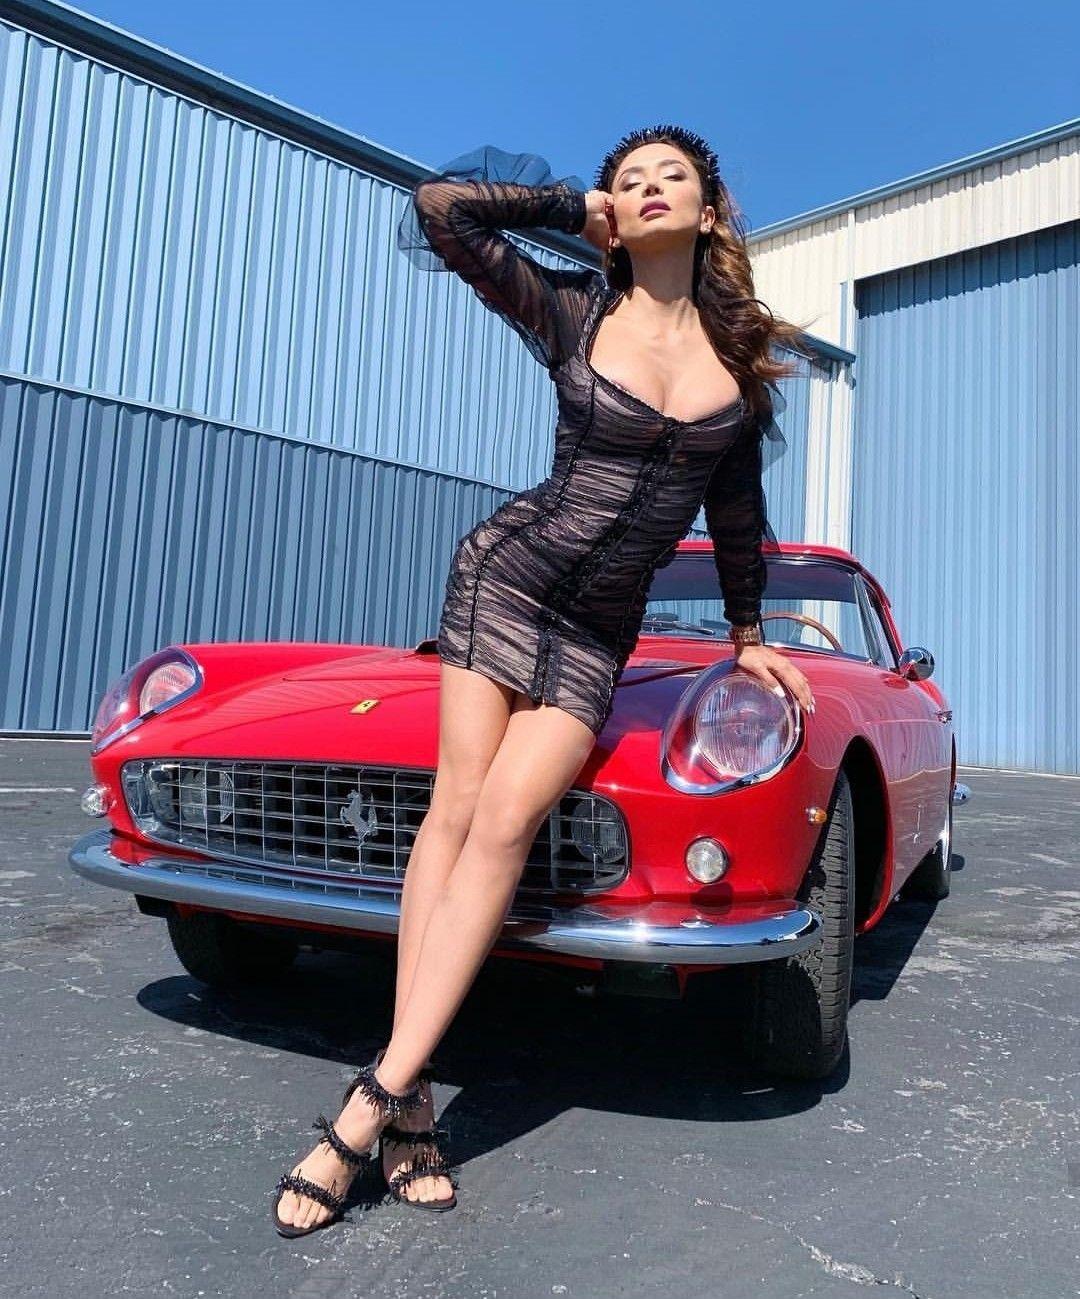 car, Girl, Cars, Girl, Model, Models, Custom, Sexy, Babe